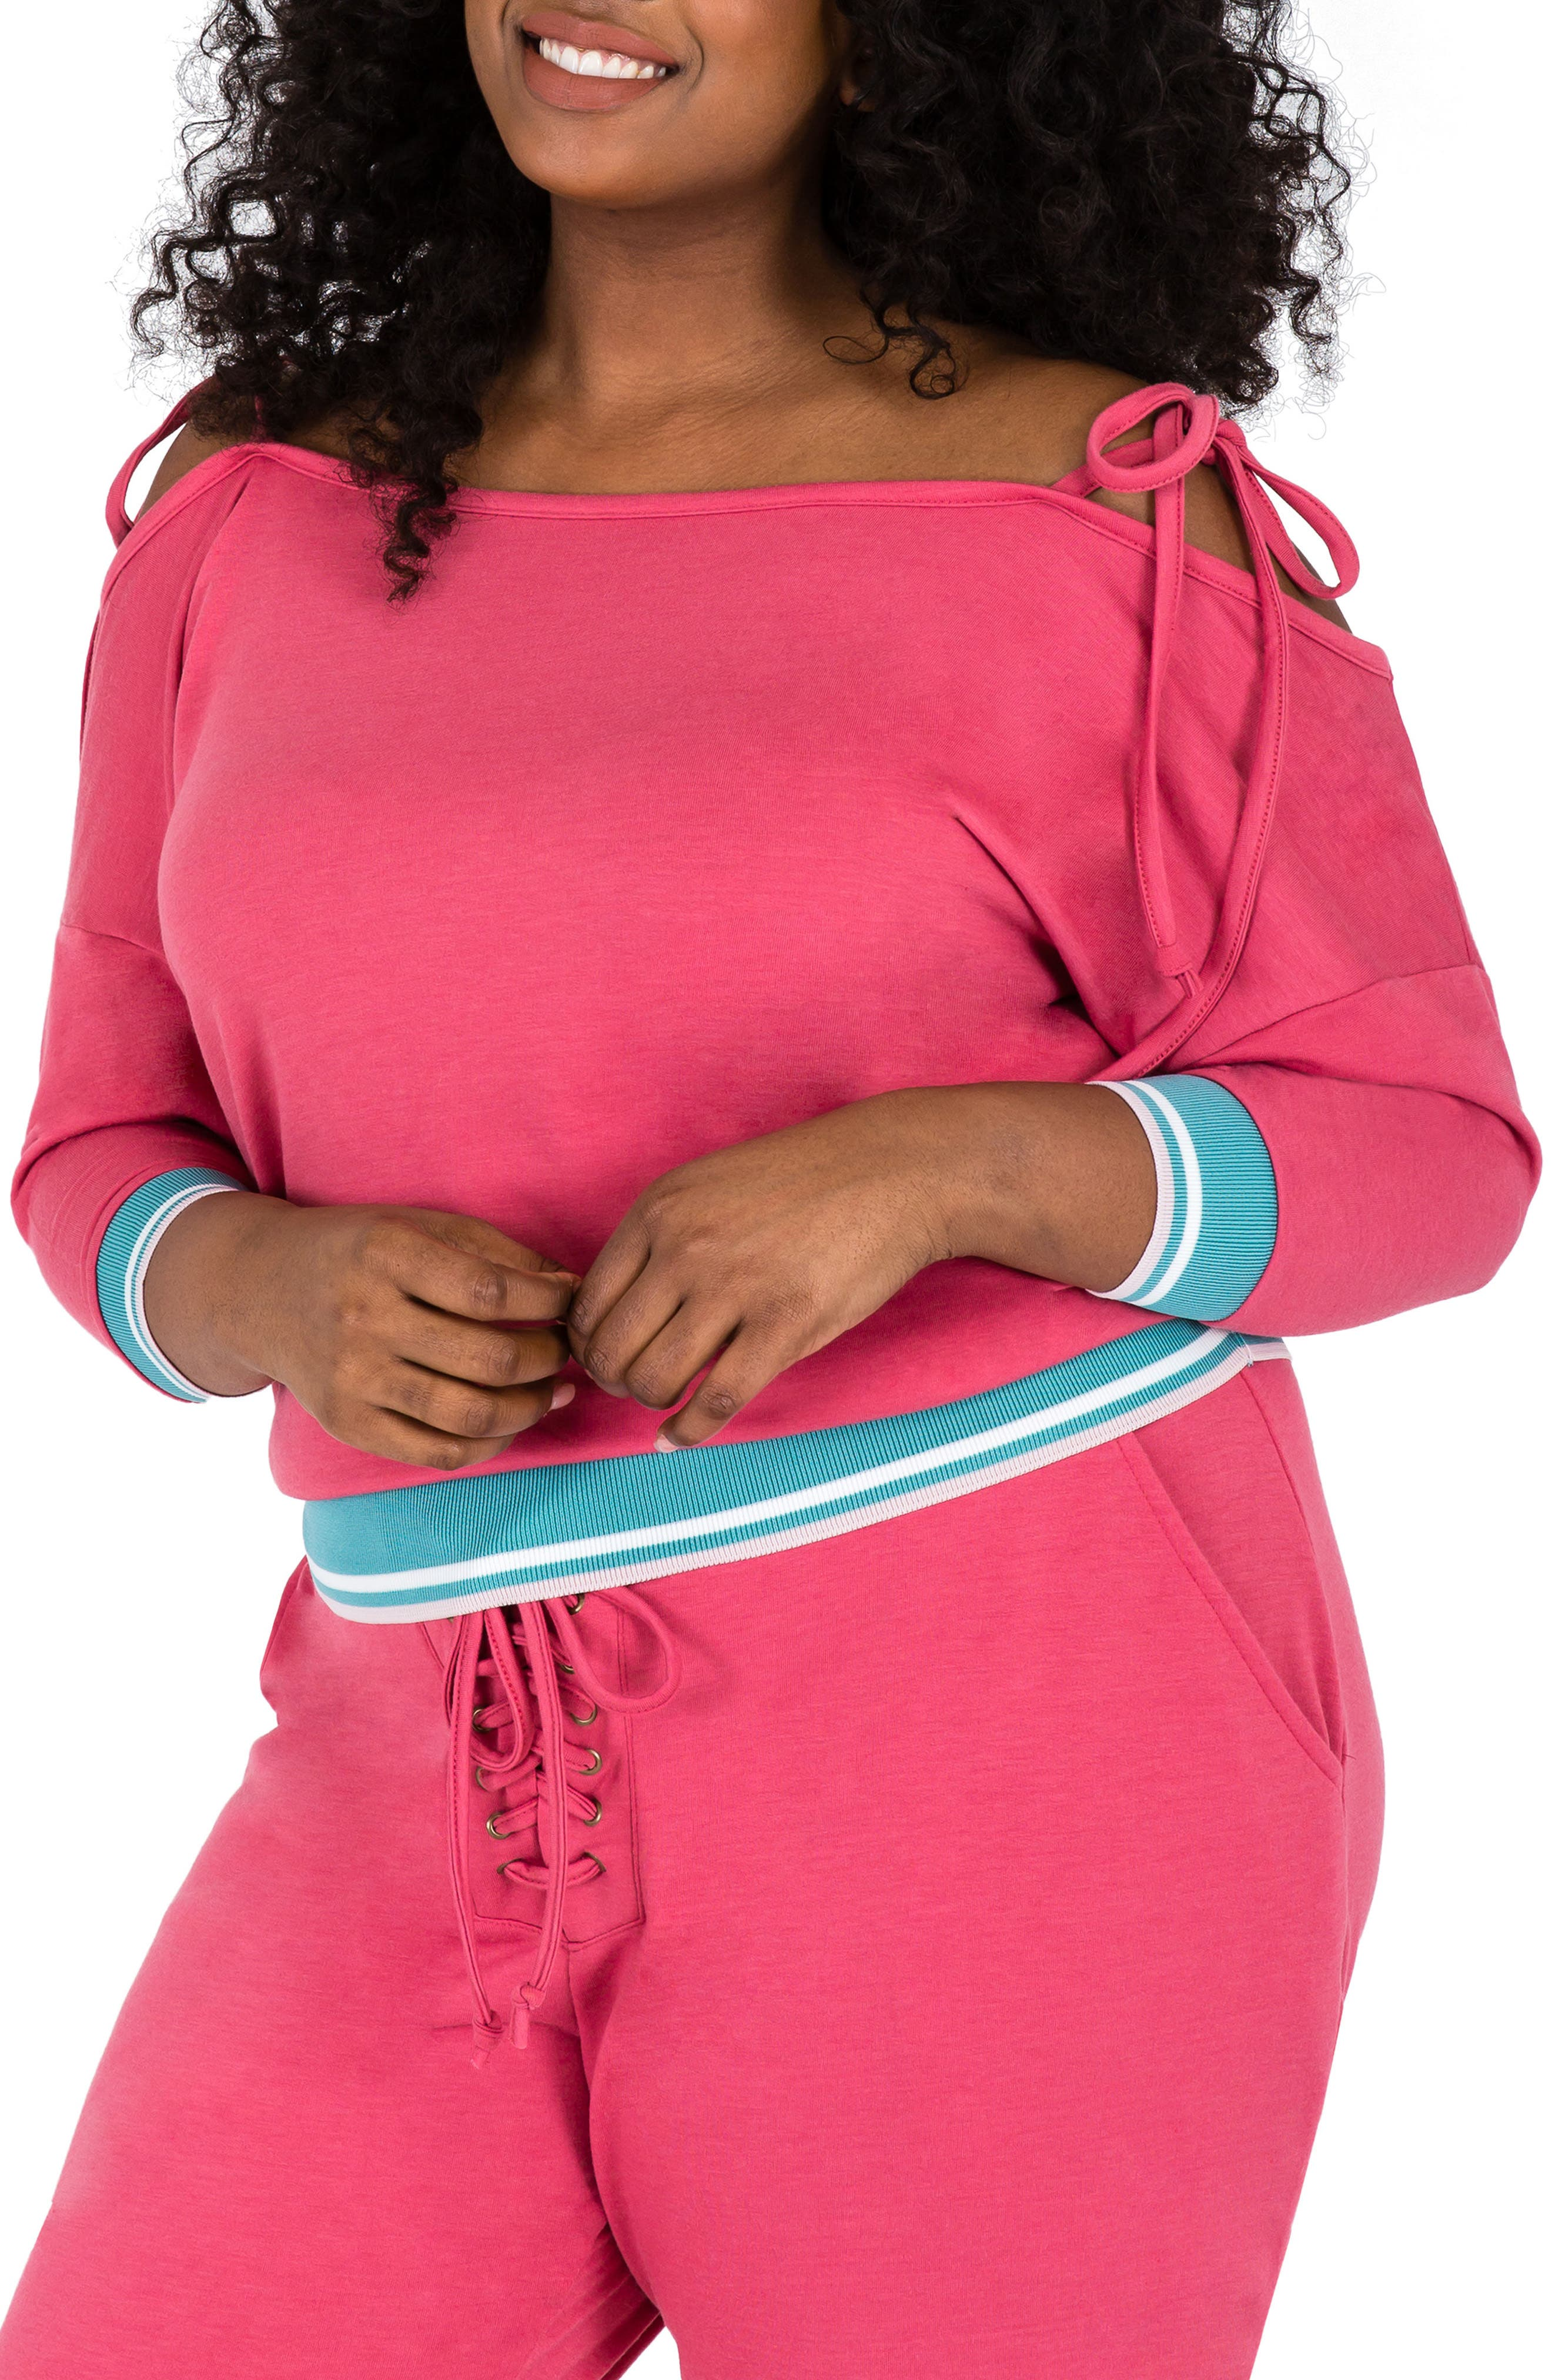 Janae Convertible Knit Top,                         Main,                         color, DEEP ROSE PINK